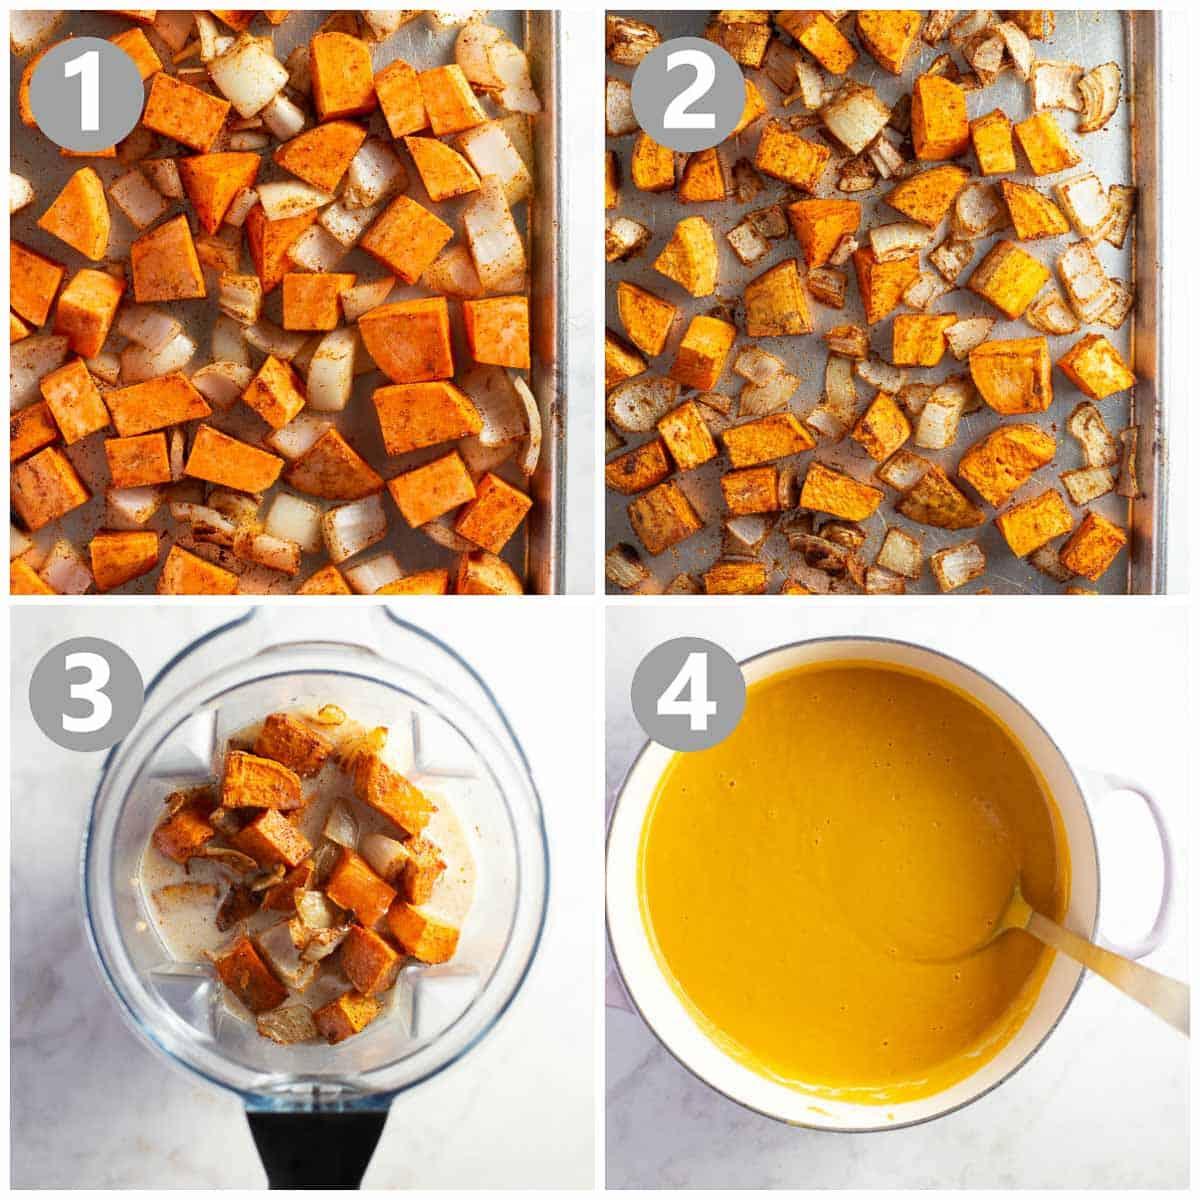 photo collage shows steps to make a sweet potato soup recipe